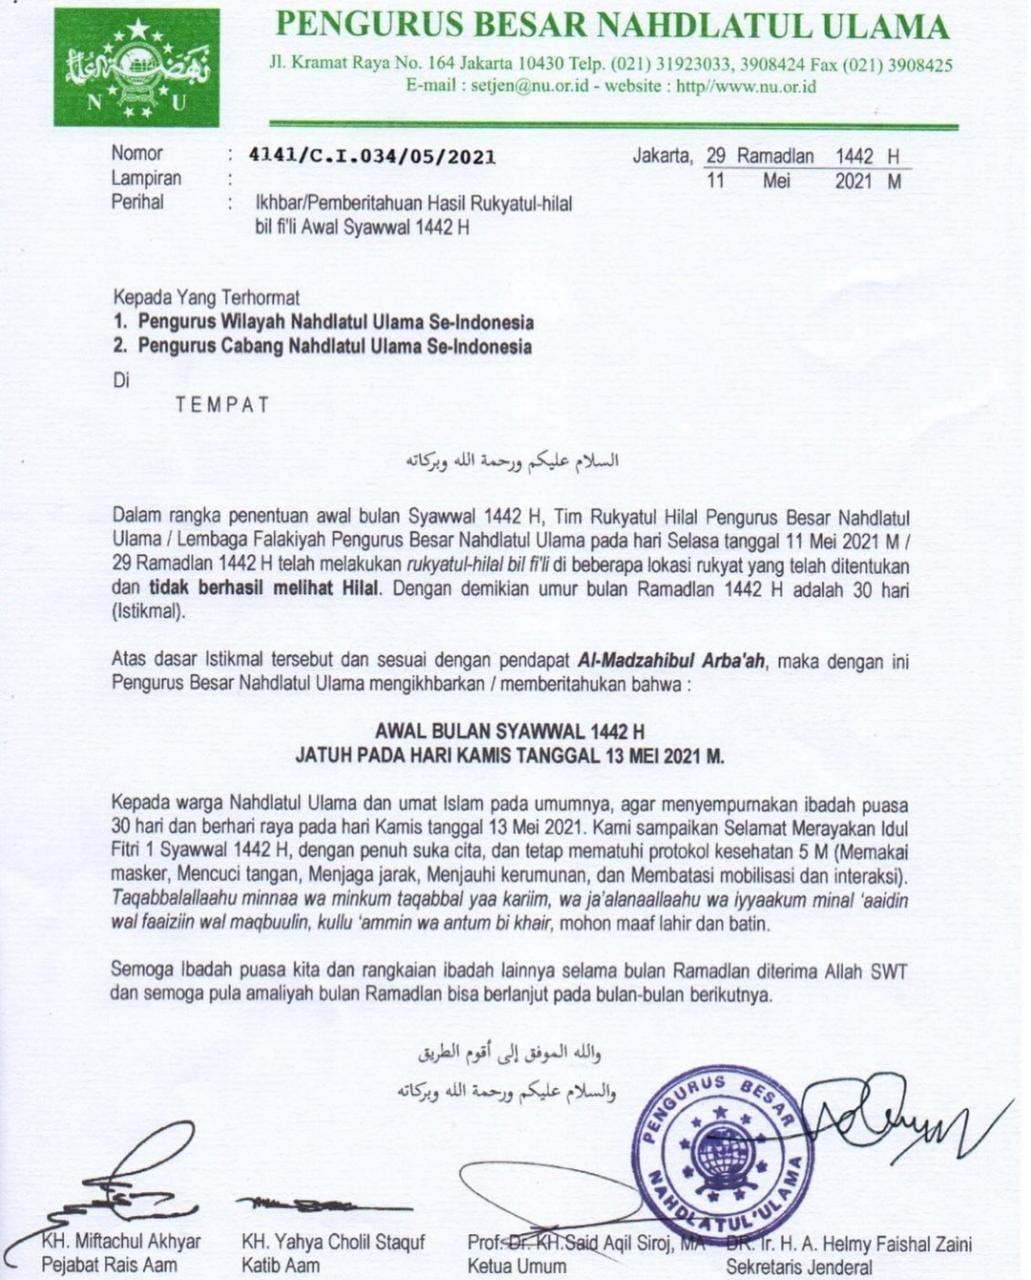 PBNU Umumkan Hari Raya Idul Fitri Jatuh Pada Kamis 13 Mei 2021